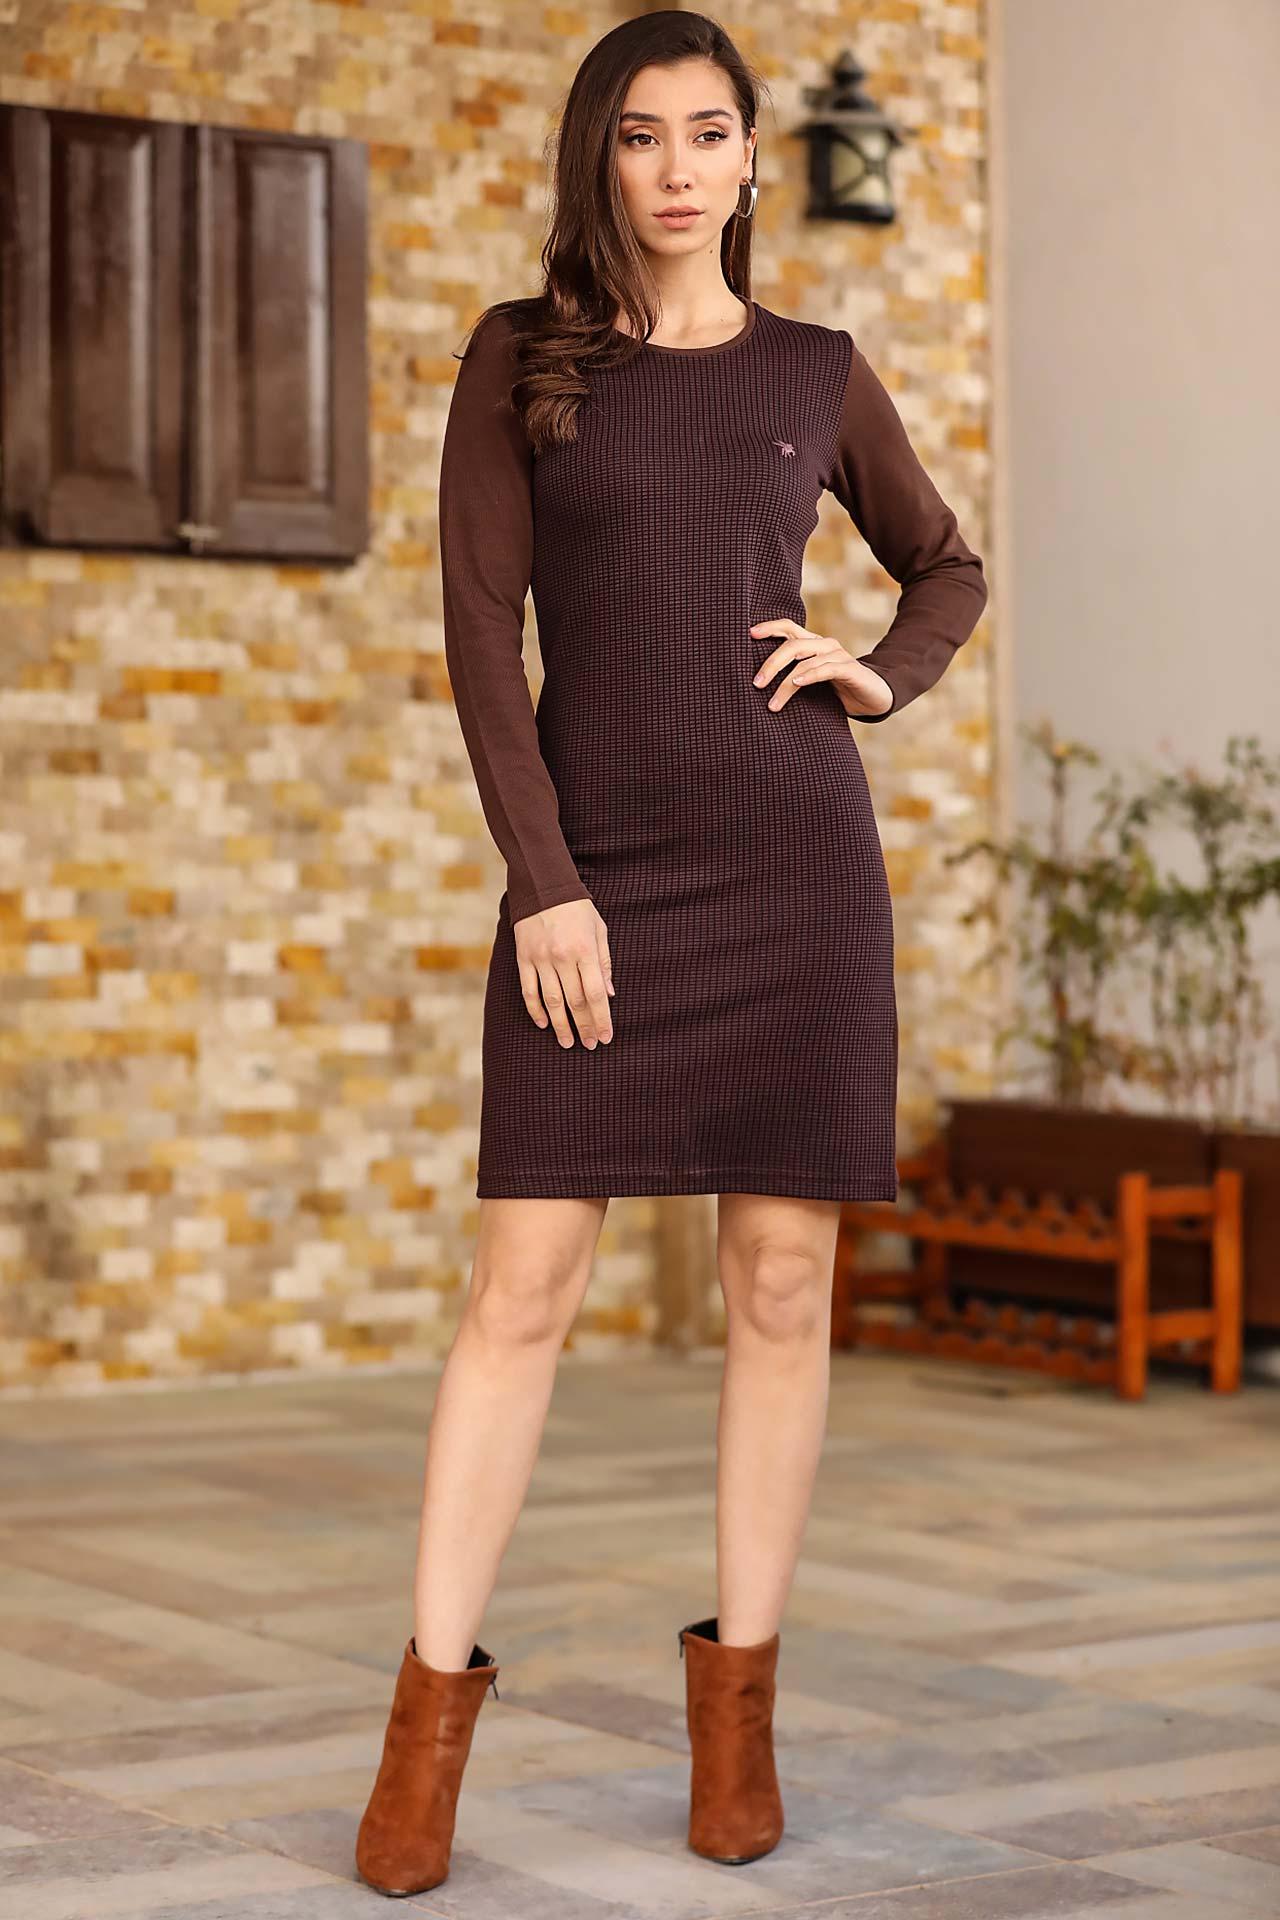 Women's Patterned Tricot Dress